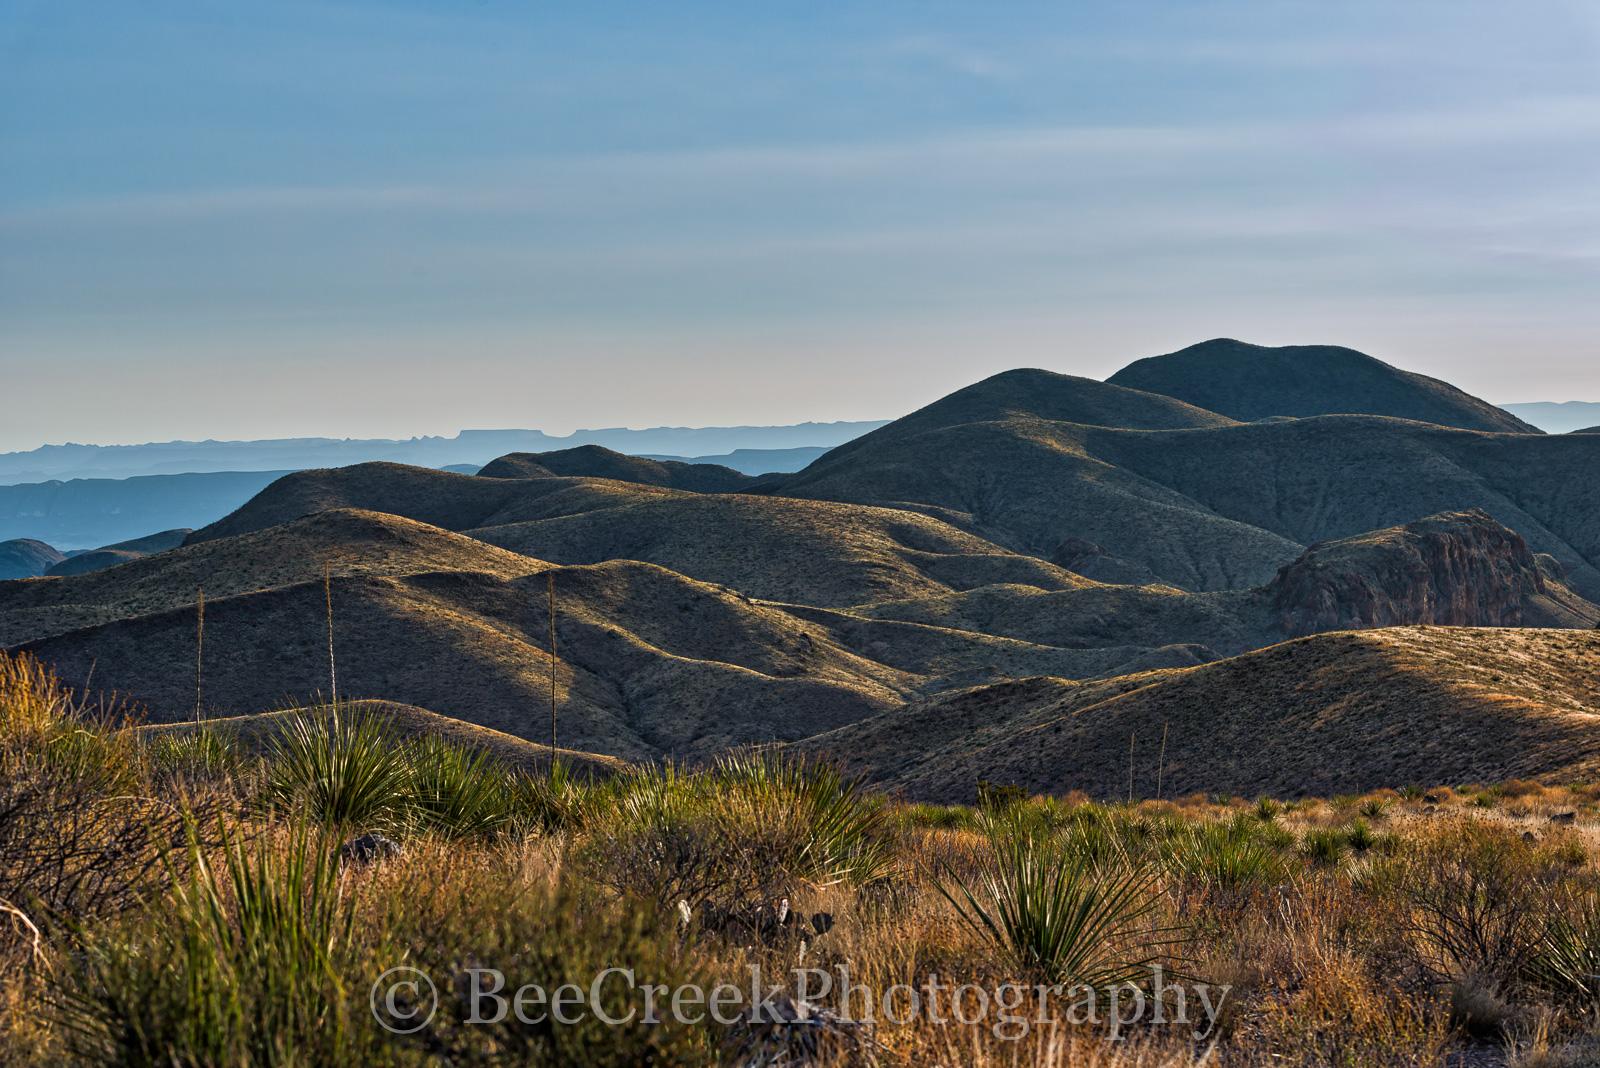 Big Bend National Park, Sotal Vista Overlook, late afternoon, photo